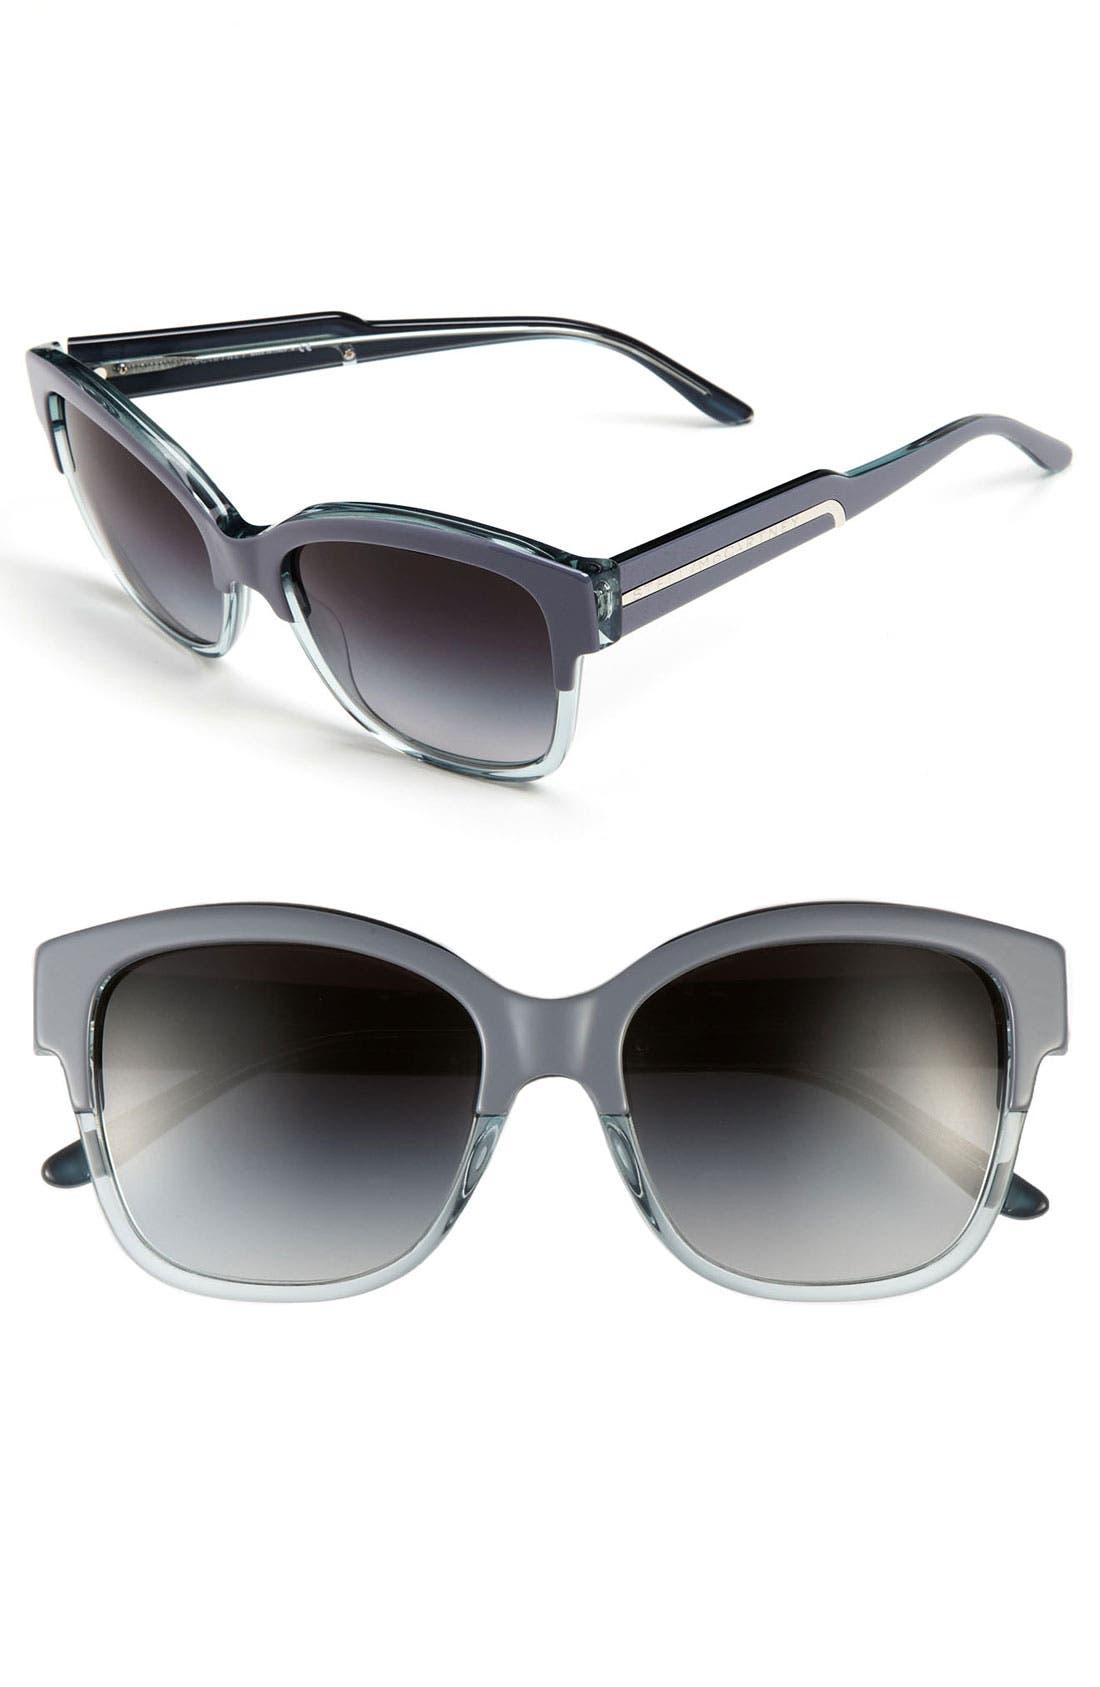 Main Image - Stella McCartney 55mm Retro Sunglasses